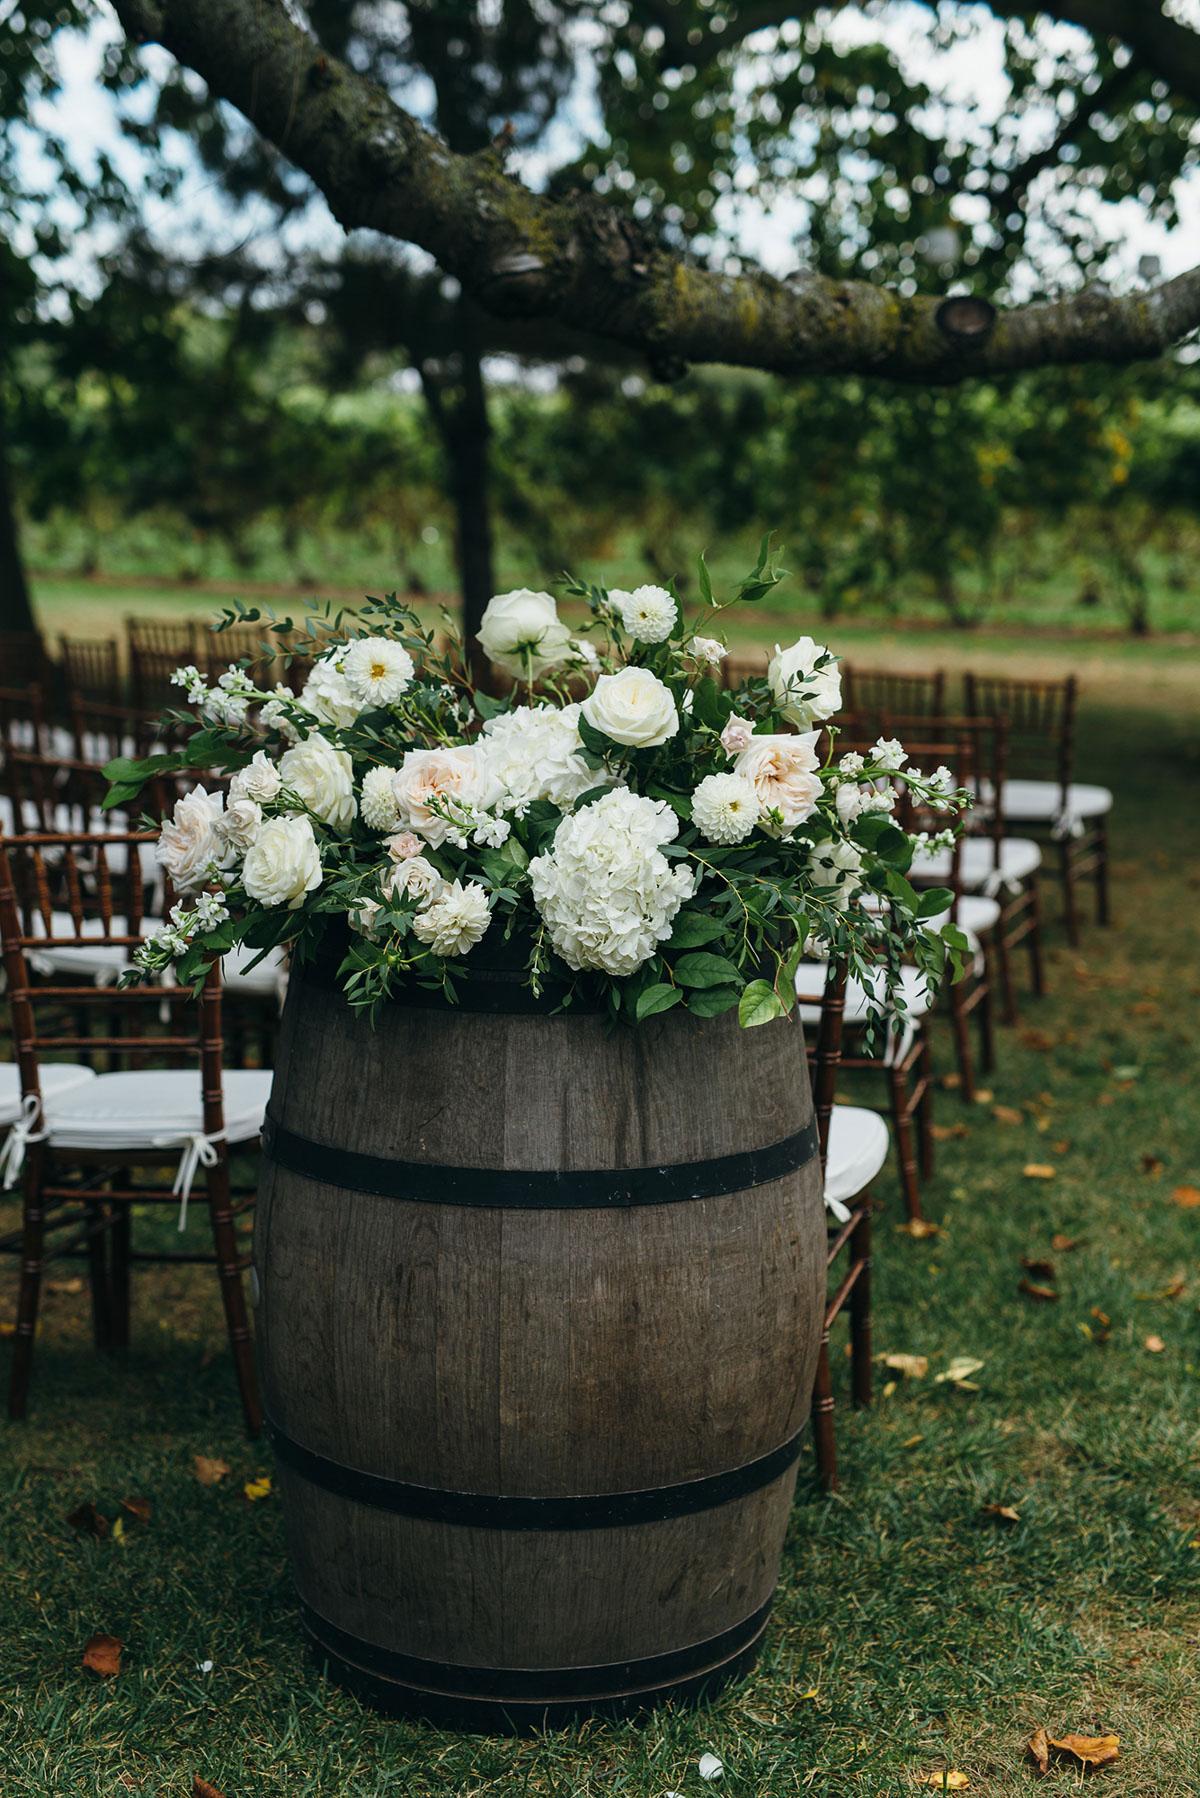 shaw-events-vineyard-bride-swish-list-kurtz-orchards-niagara-on-the-lake-wedding-14.jpg